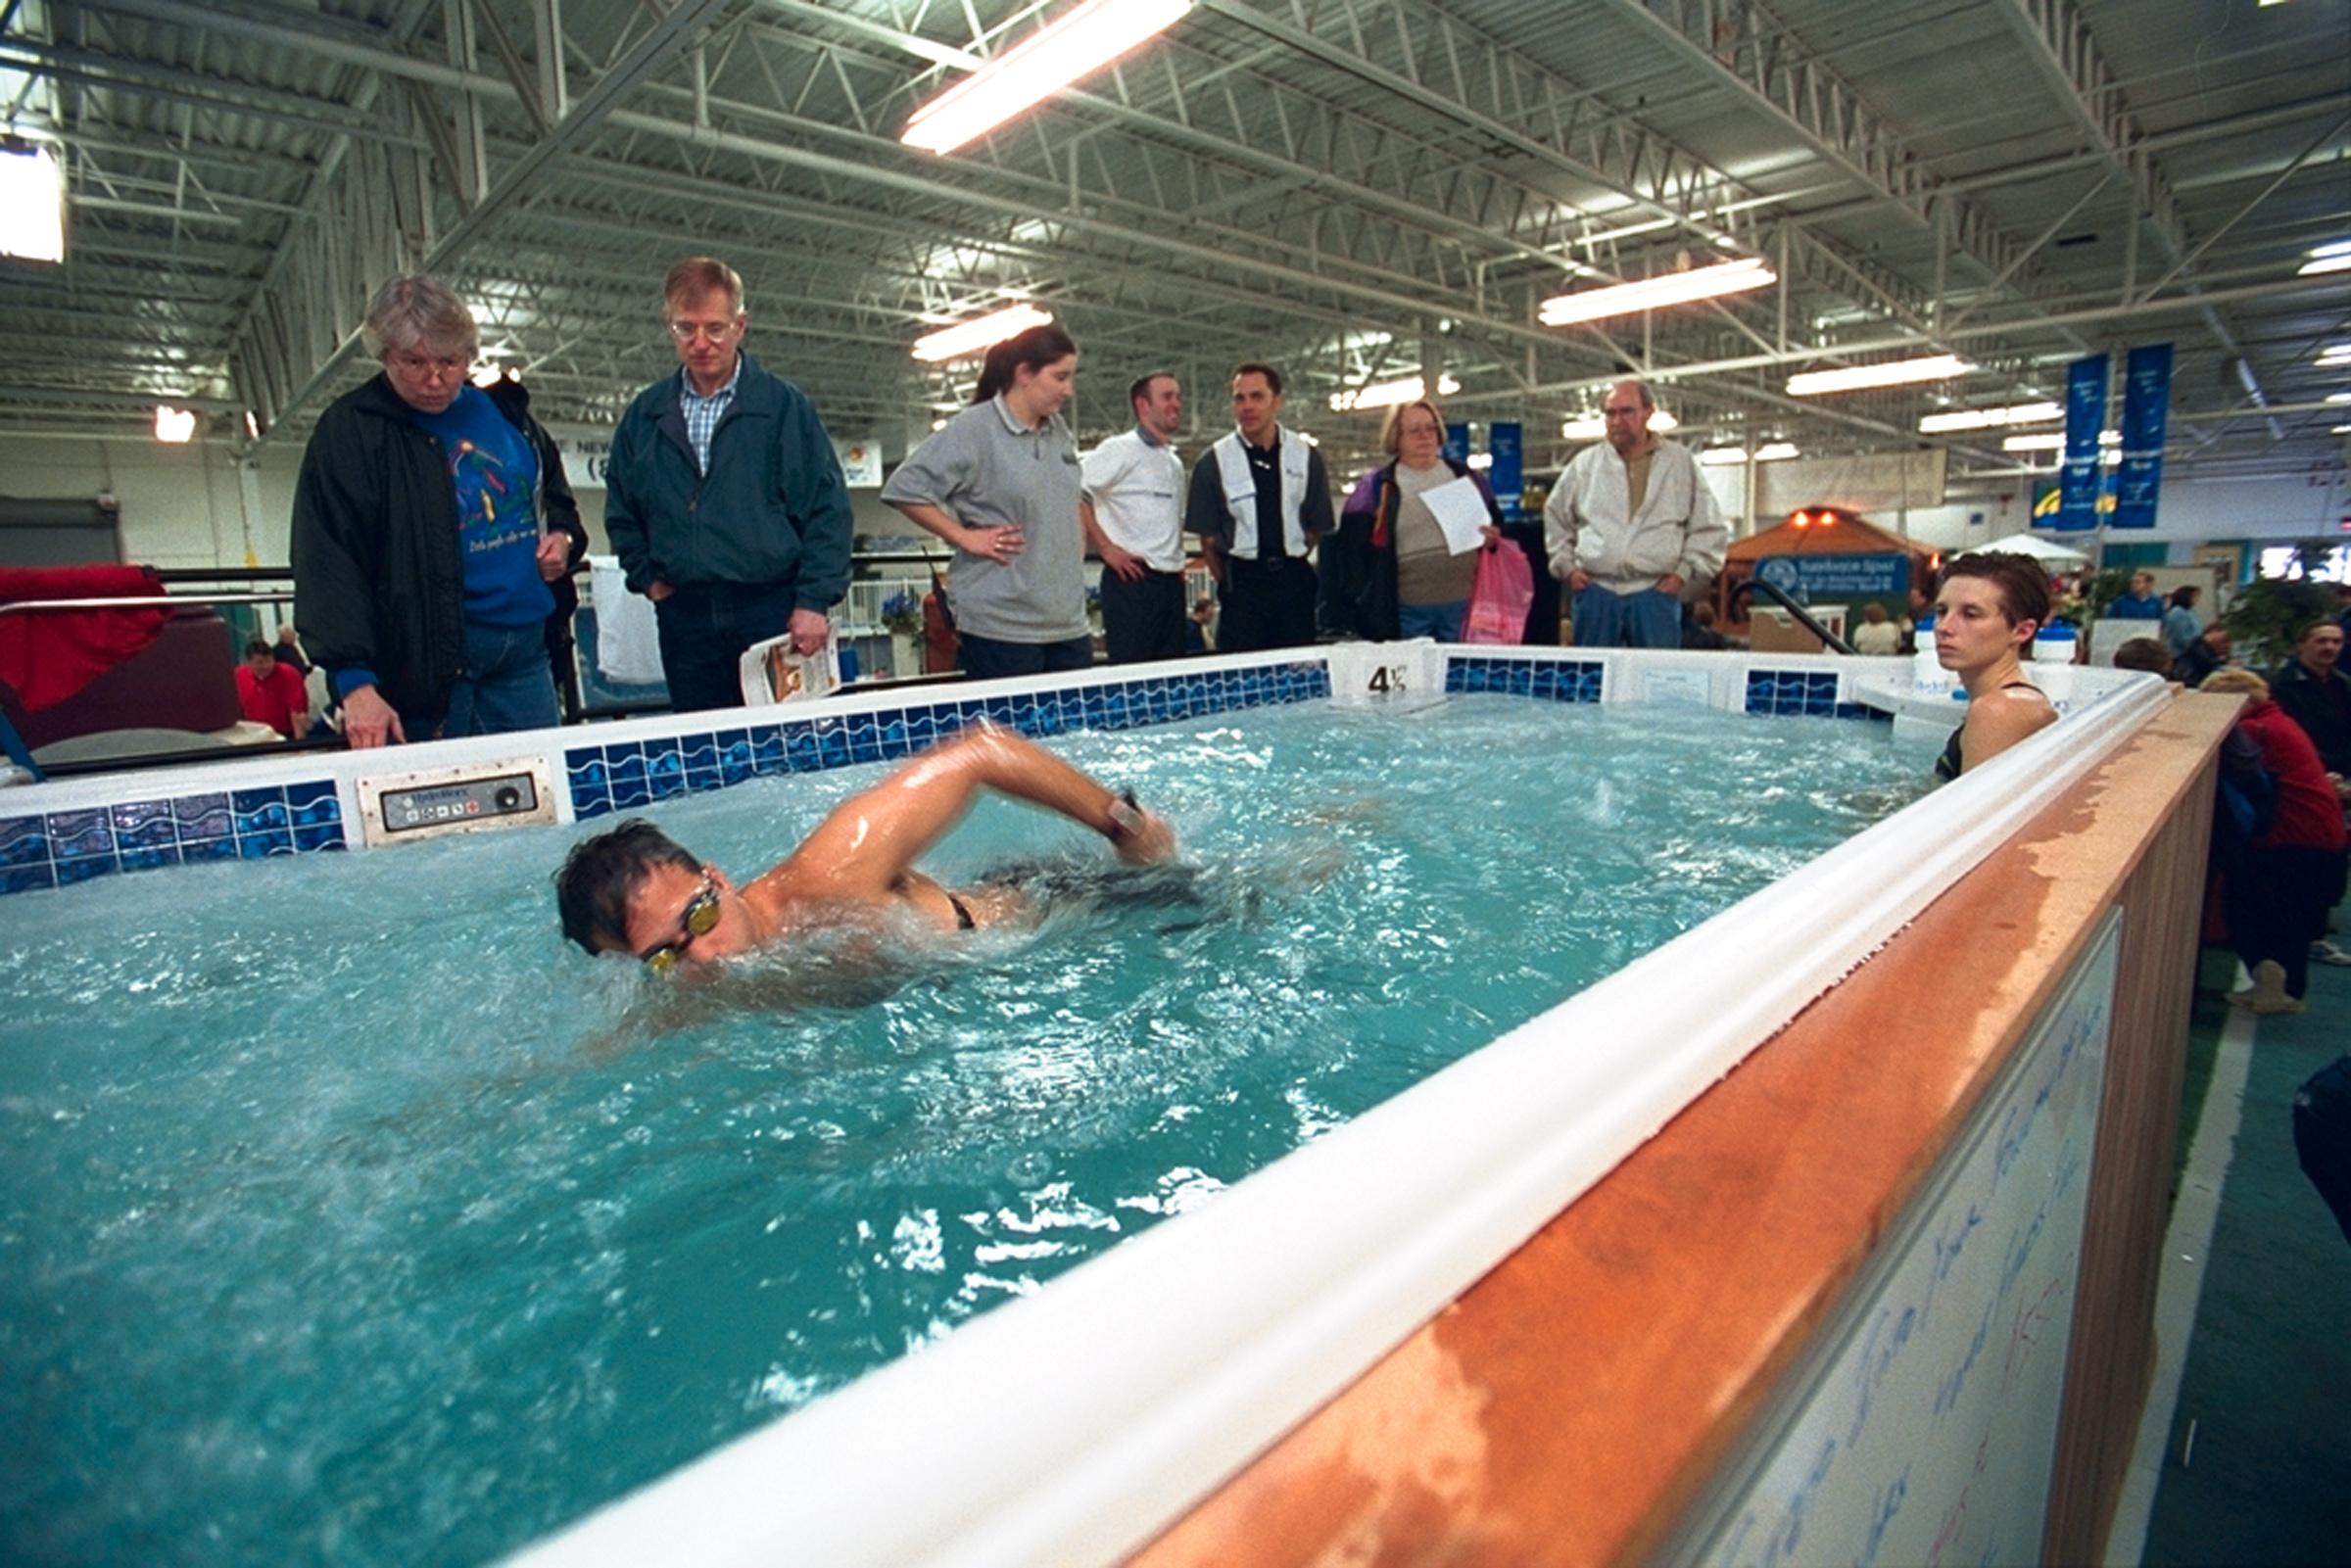 Novi Backyard, Pool & Spa Show Opens Friday, March 22 in Novi